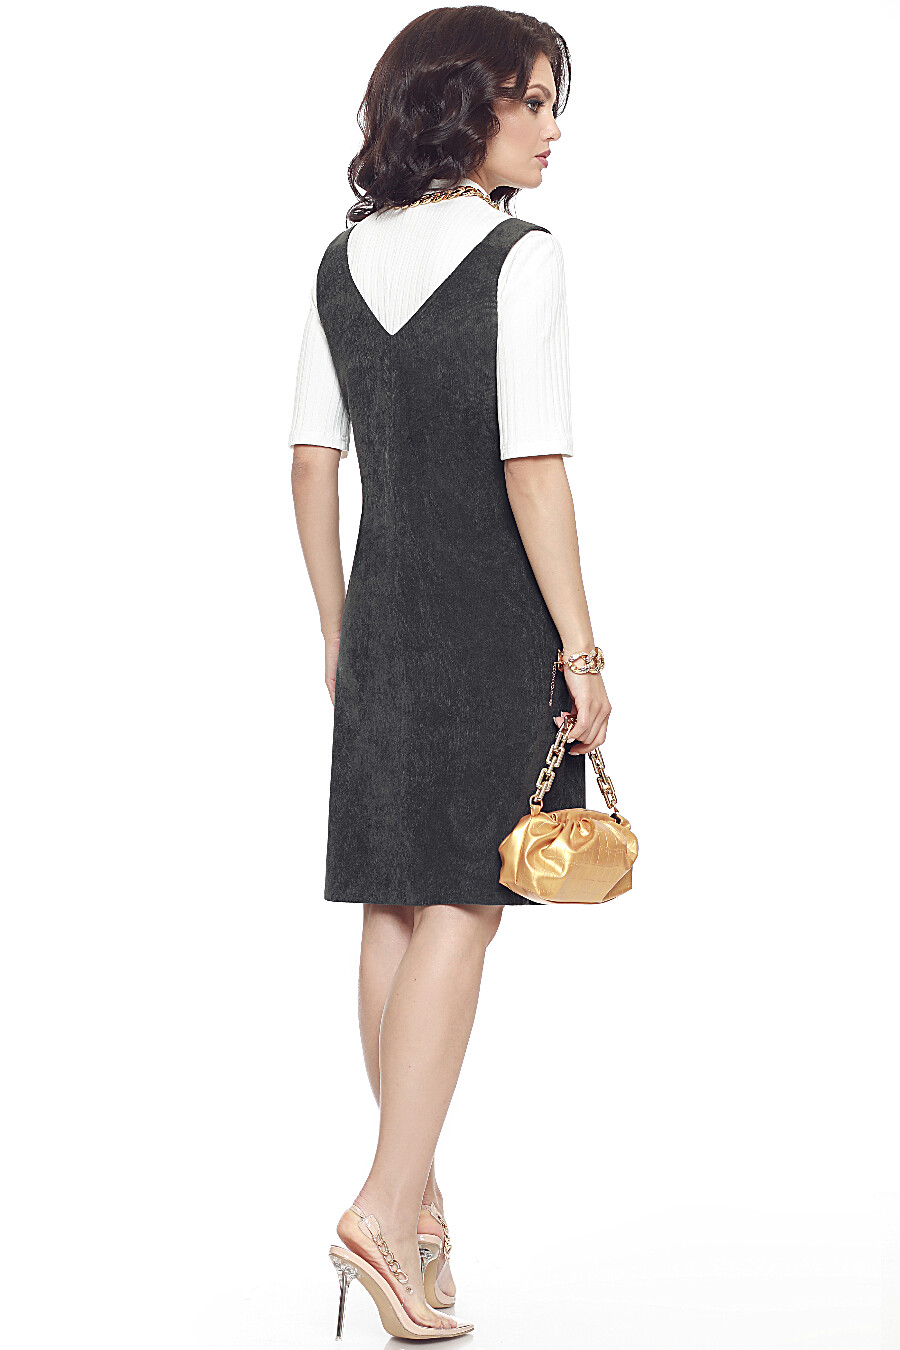 Сарафан DSTREND (708651), купить в Moyo.moda